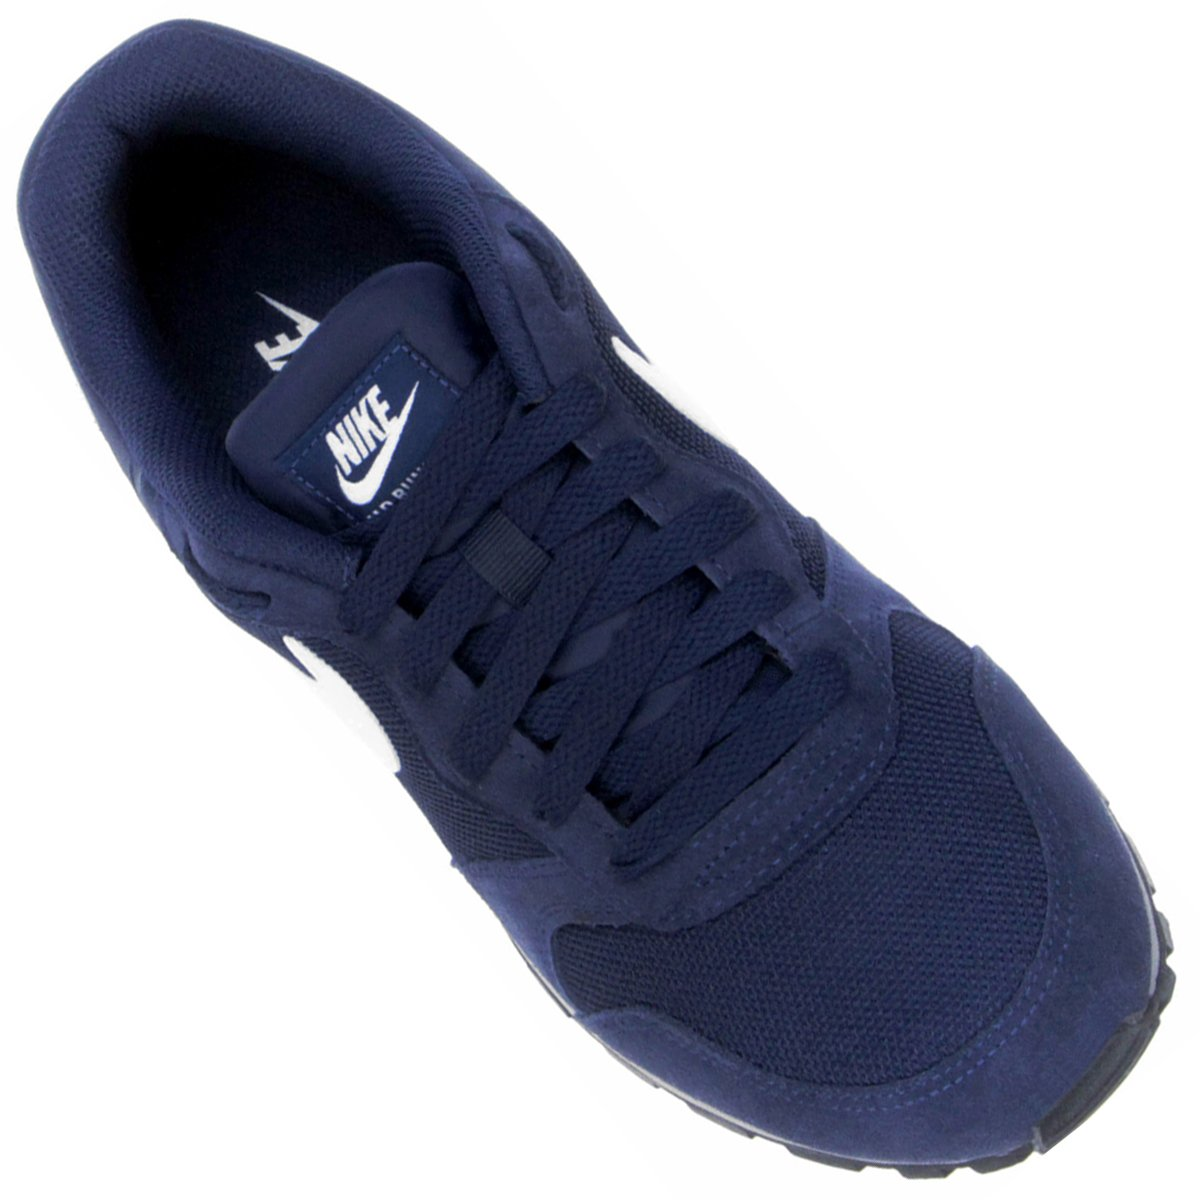 Tênis Nike Md Runner 2 Masculino - Marinho e Branco - Compre Agora ... b3bc7939b146e